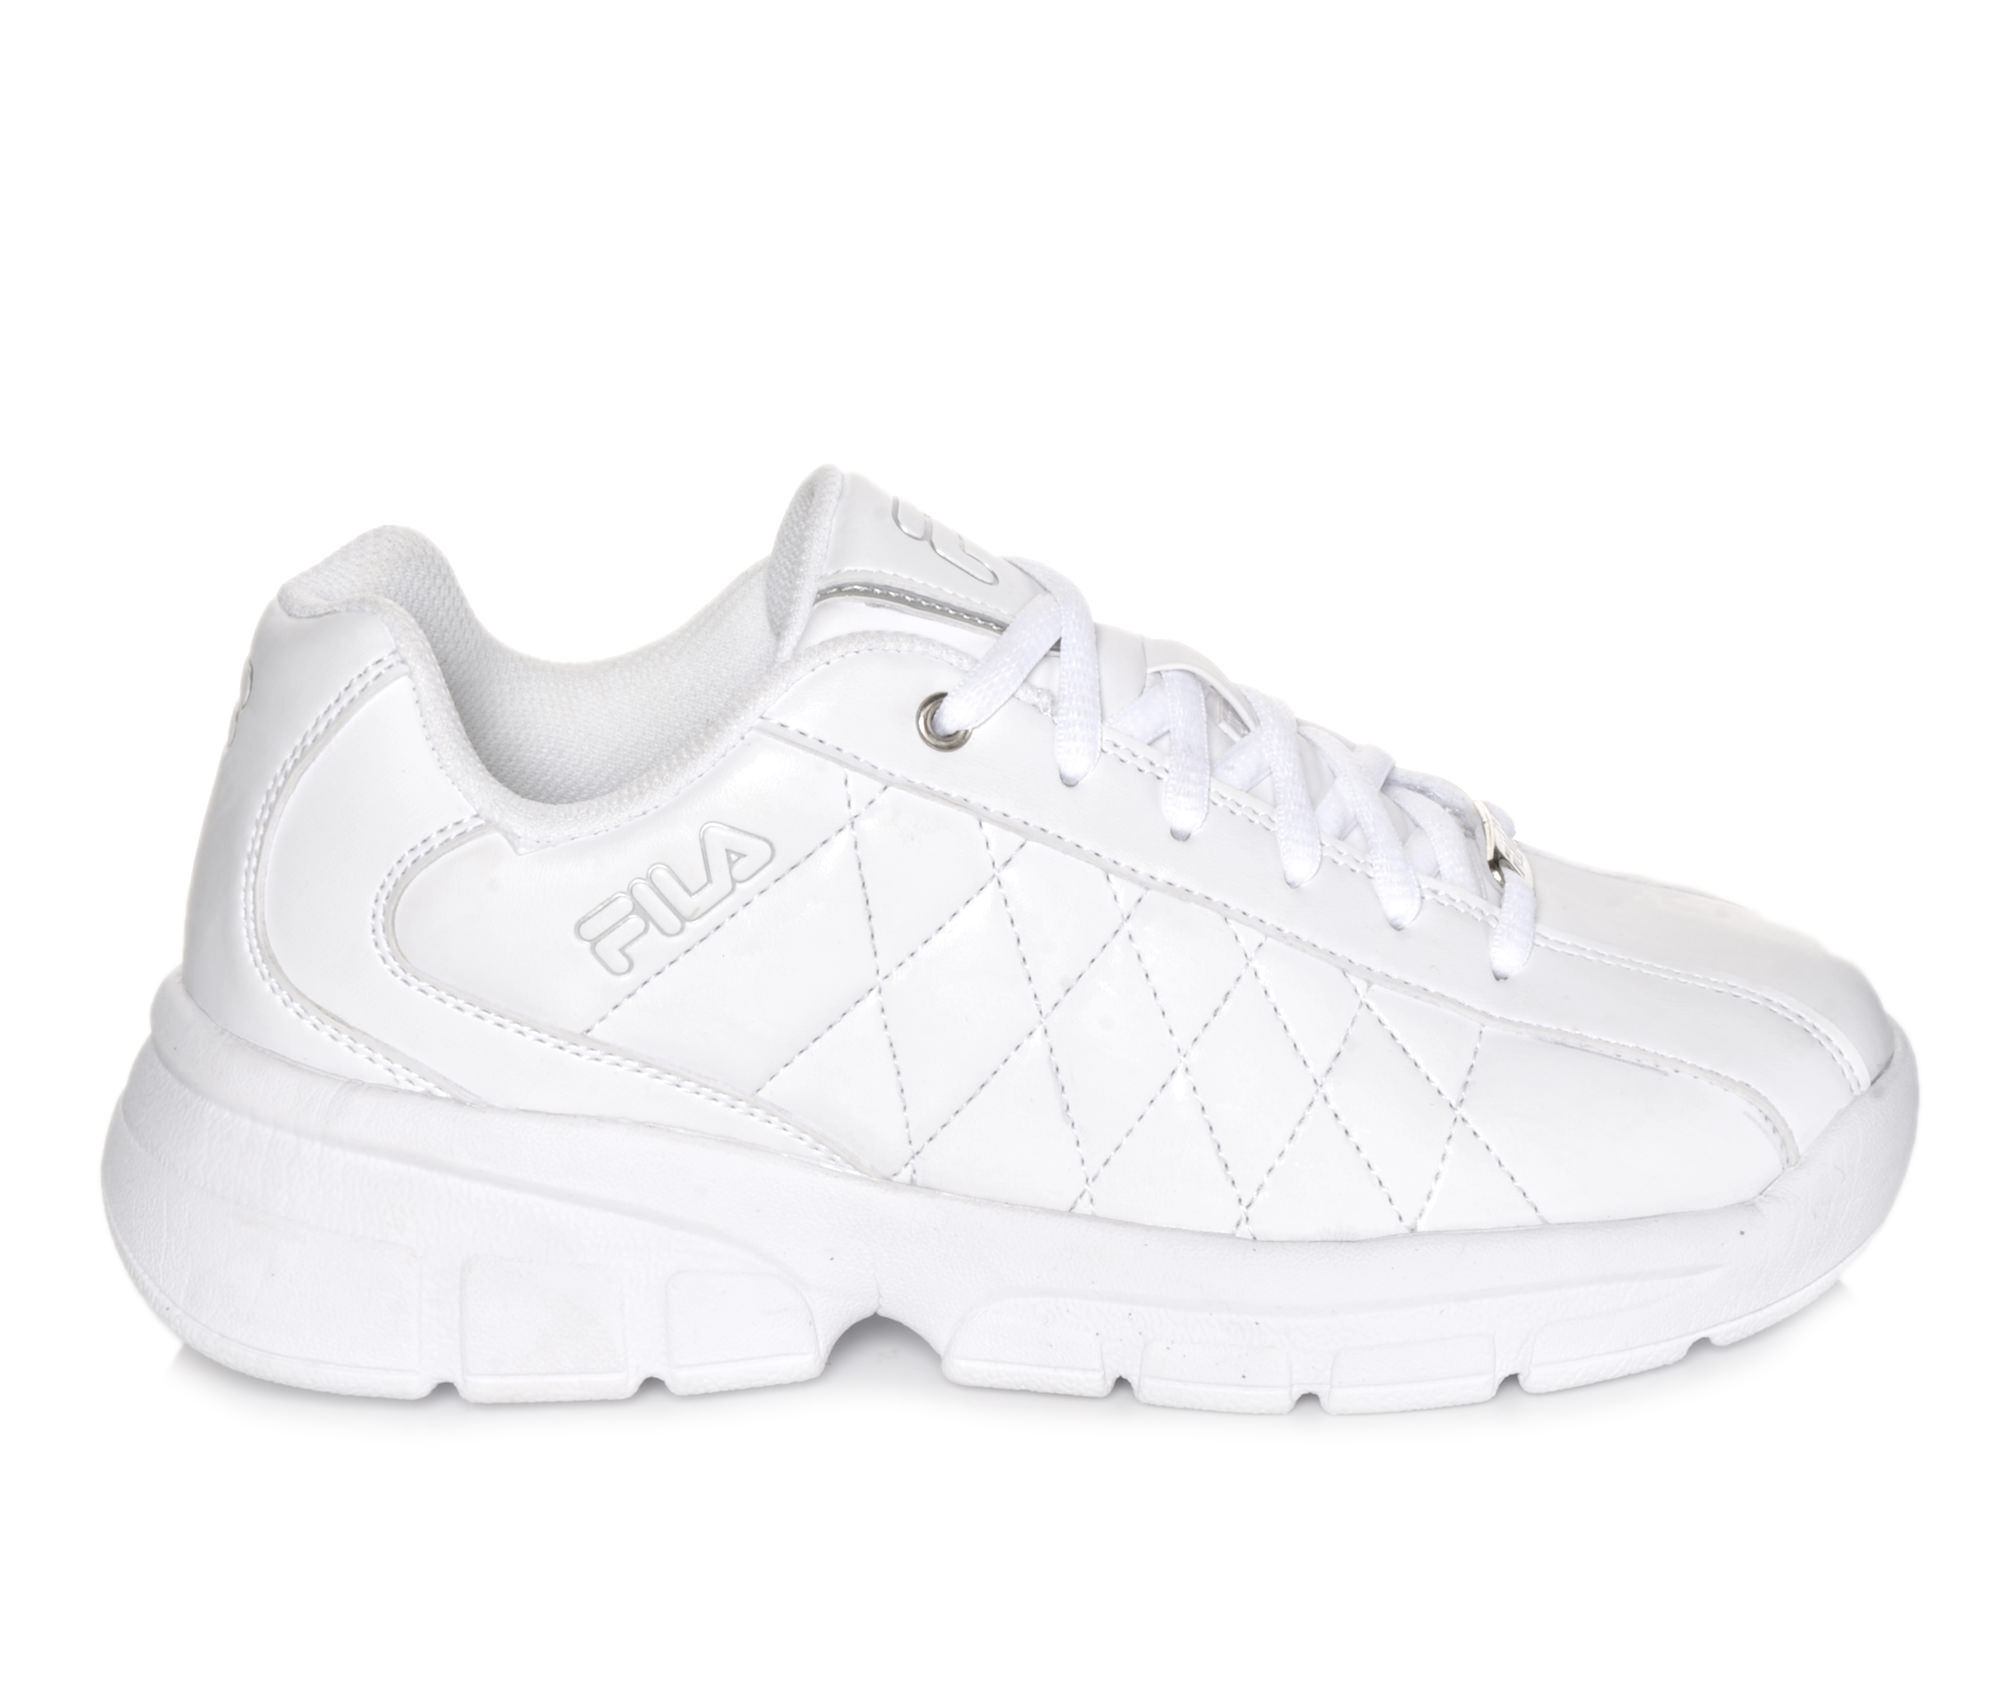 Fila Shoes Fila Fulcrum 3 Womens Sports Shoes White/Silver